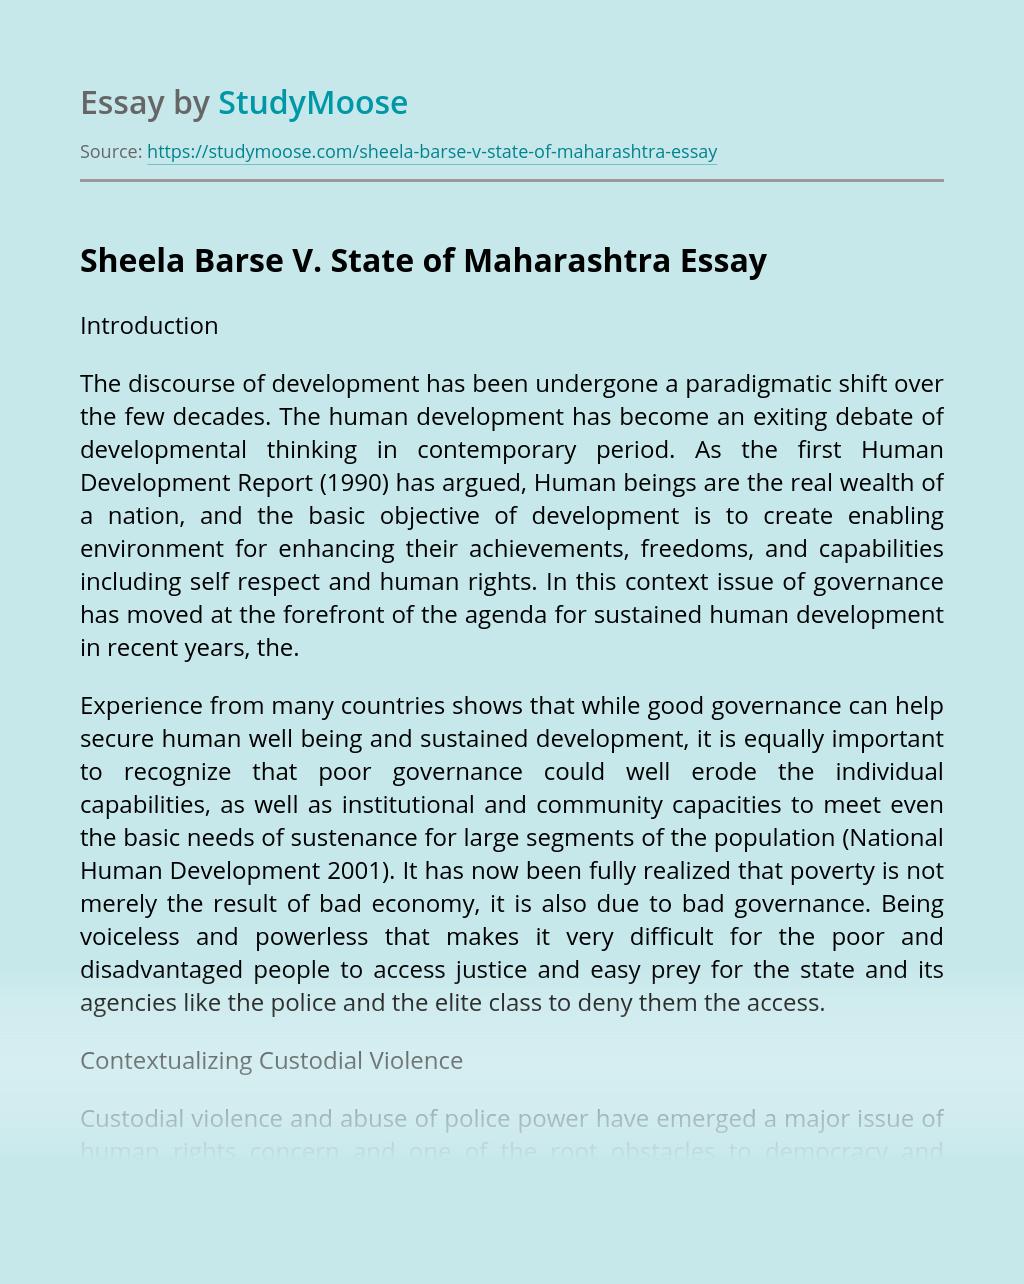 Sheela Barse V. State of Maharashtra